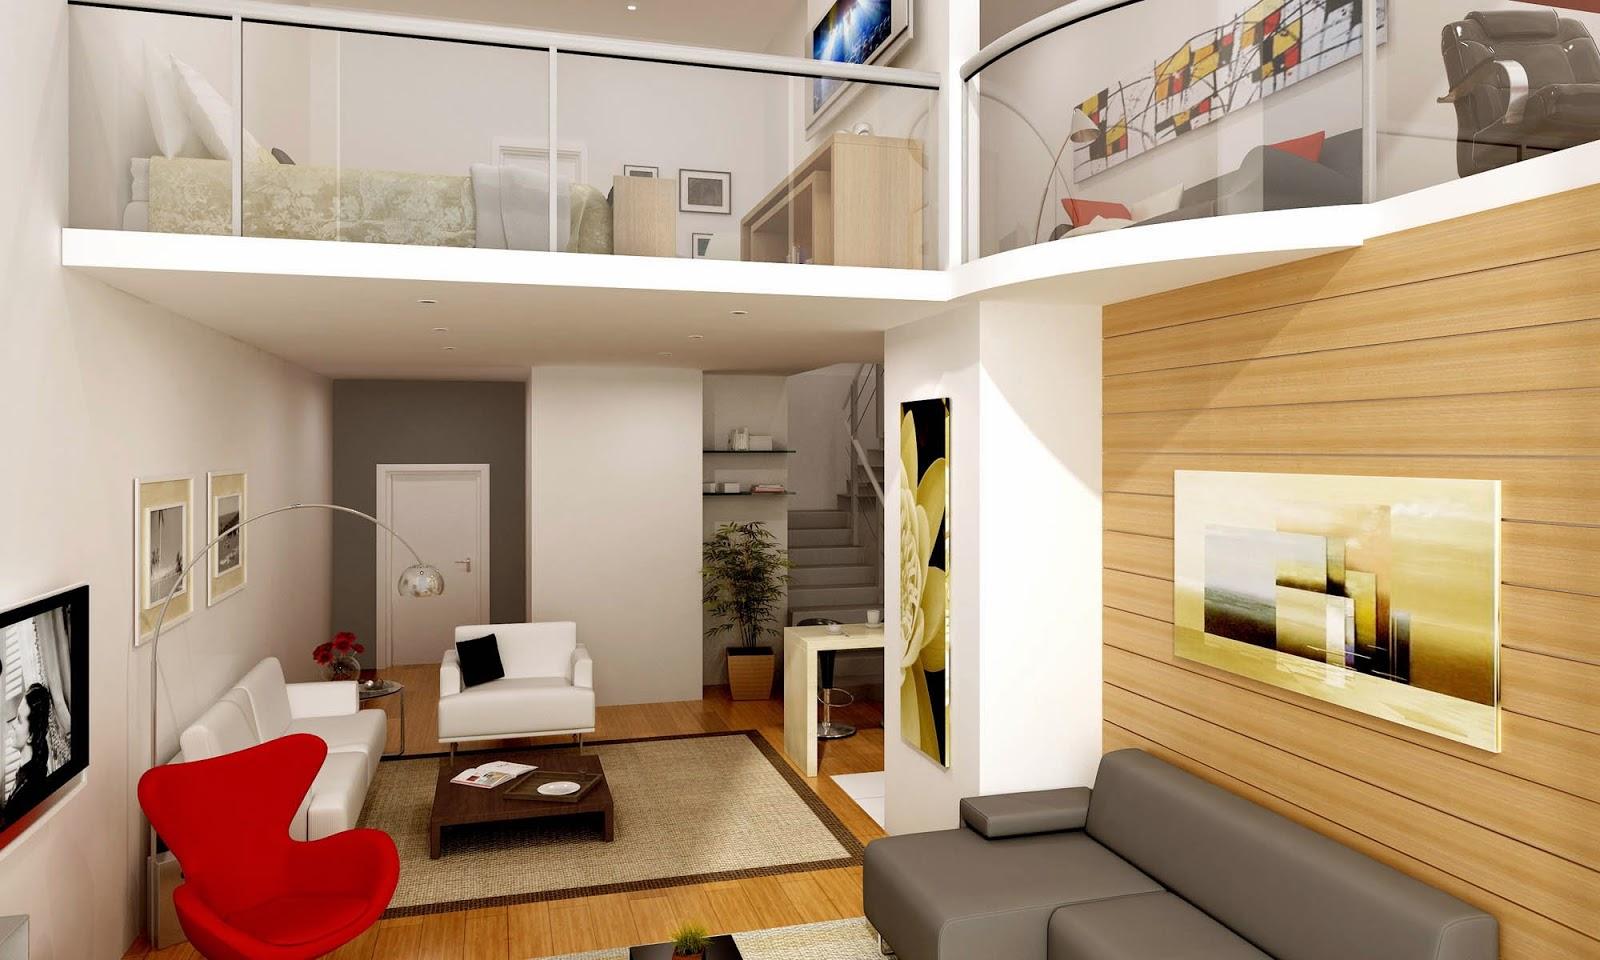 construtora vion loft tend ncia ou estilo de vida. Black Bedroom Furniture Sets. Home Design Ideas